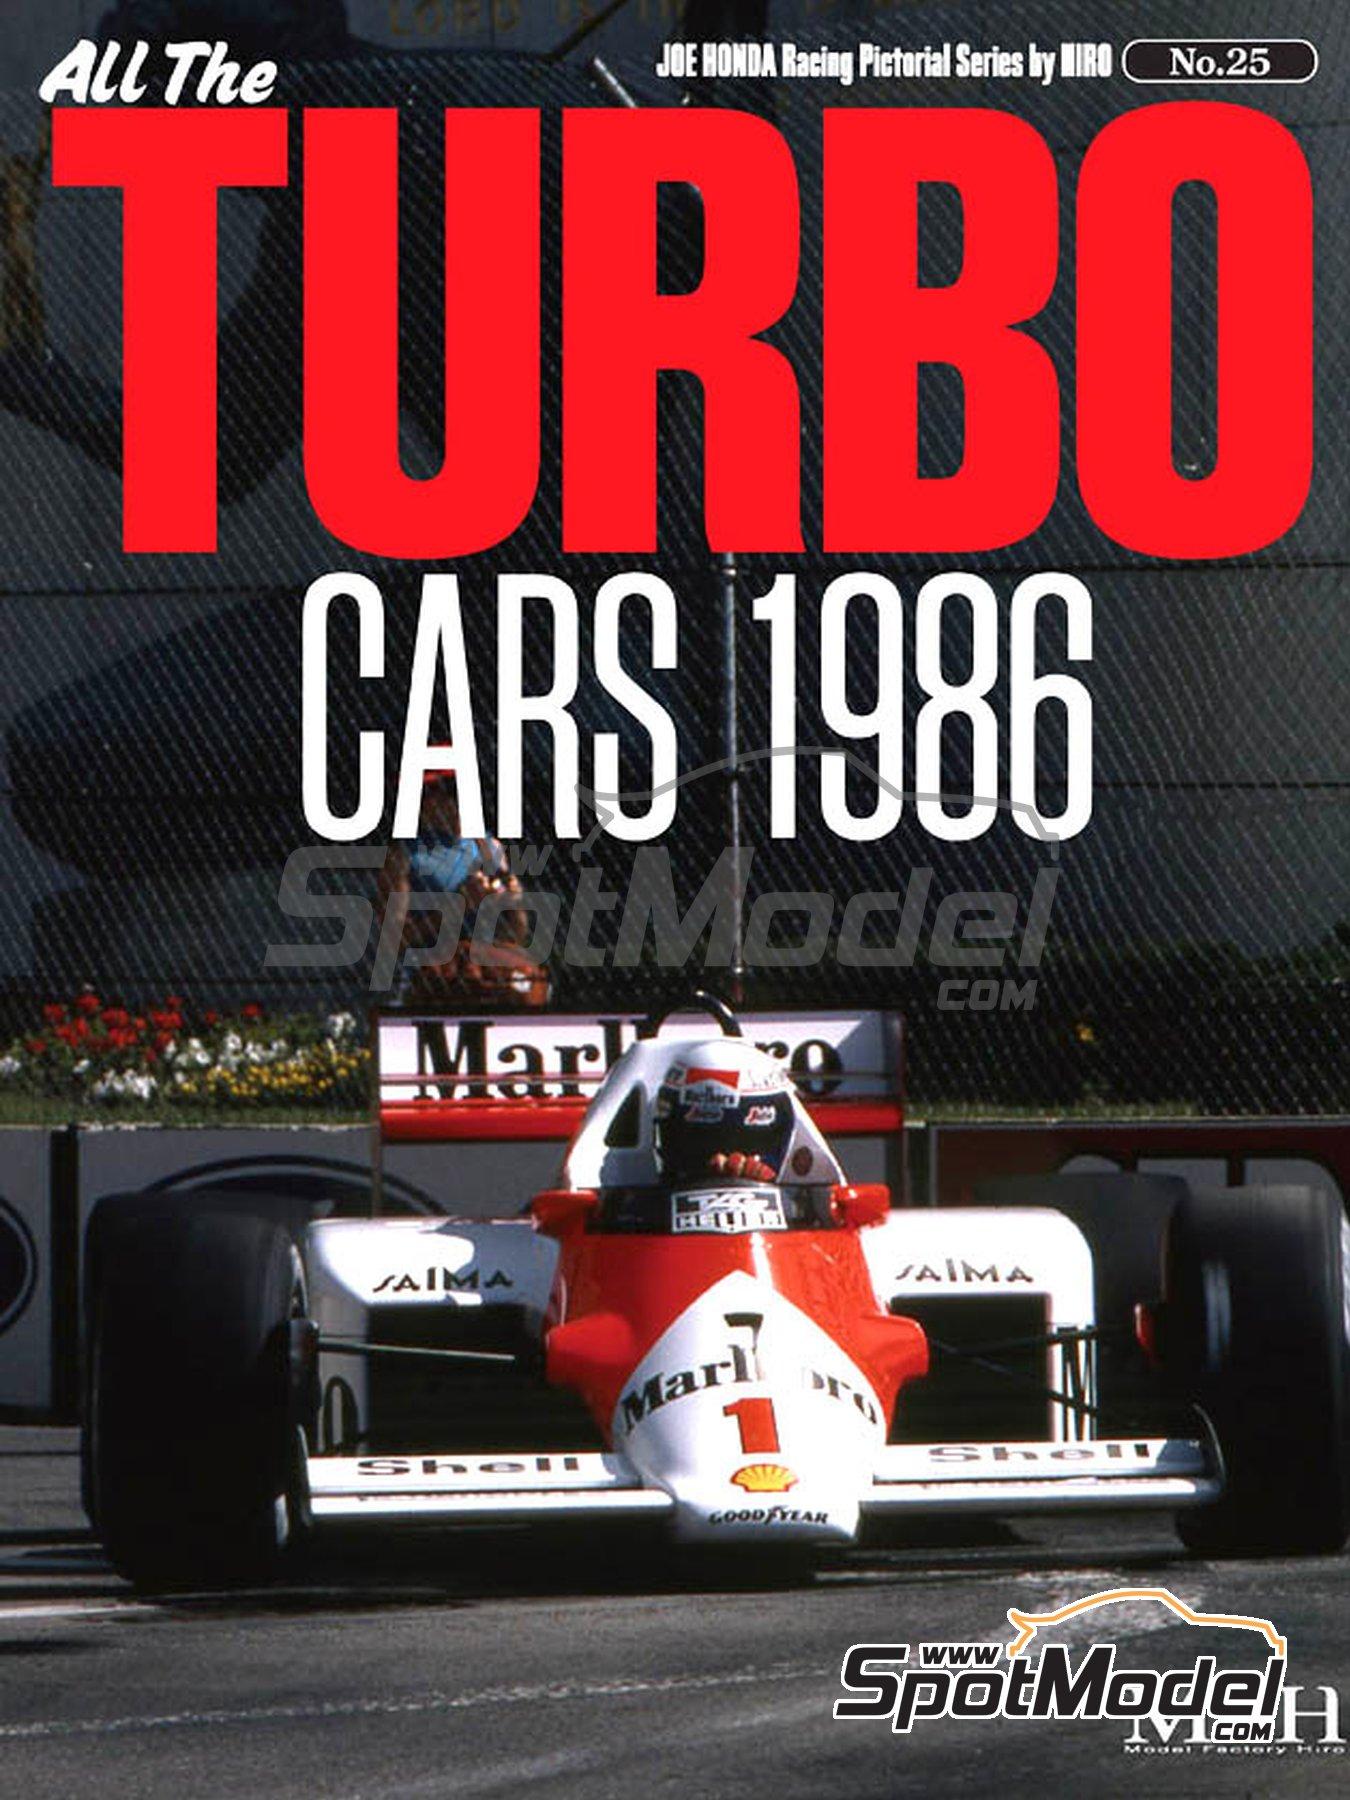 JOE HONDA Racing Pictorial Series - All The TURBO CARS -  1986 | Libro de referencia fabricado por Model Factory Hiro (ref.MFH-JH25) image